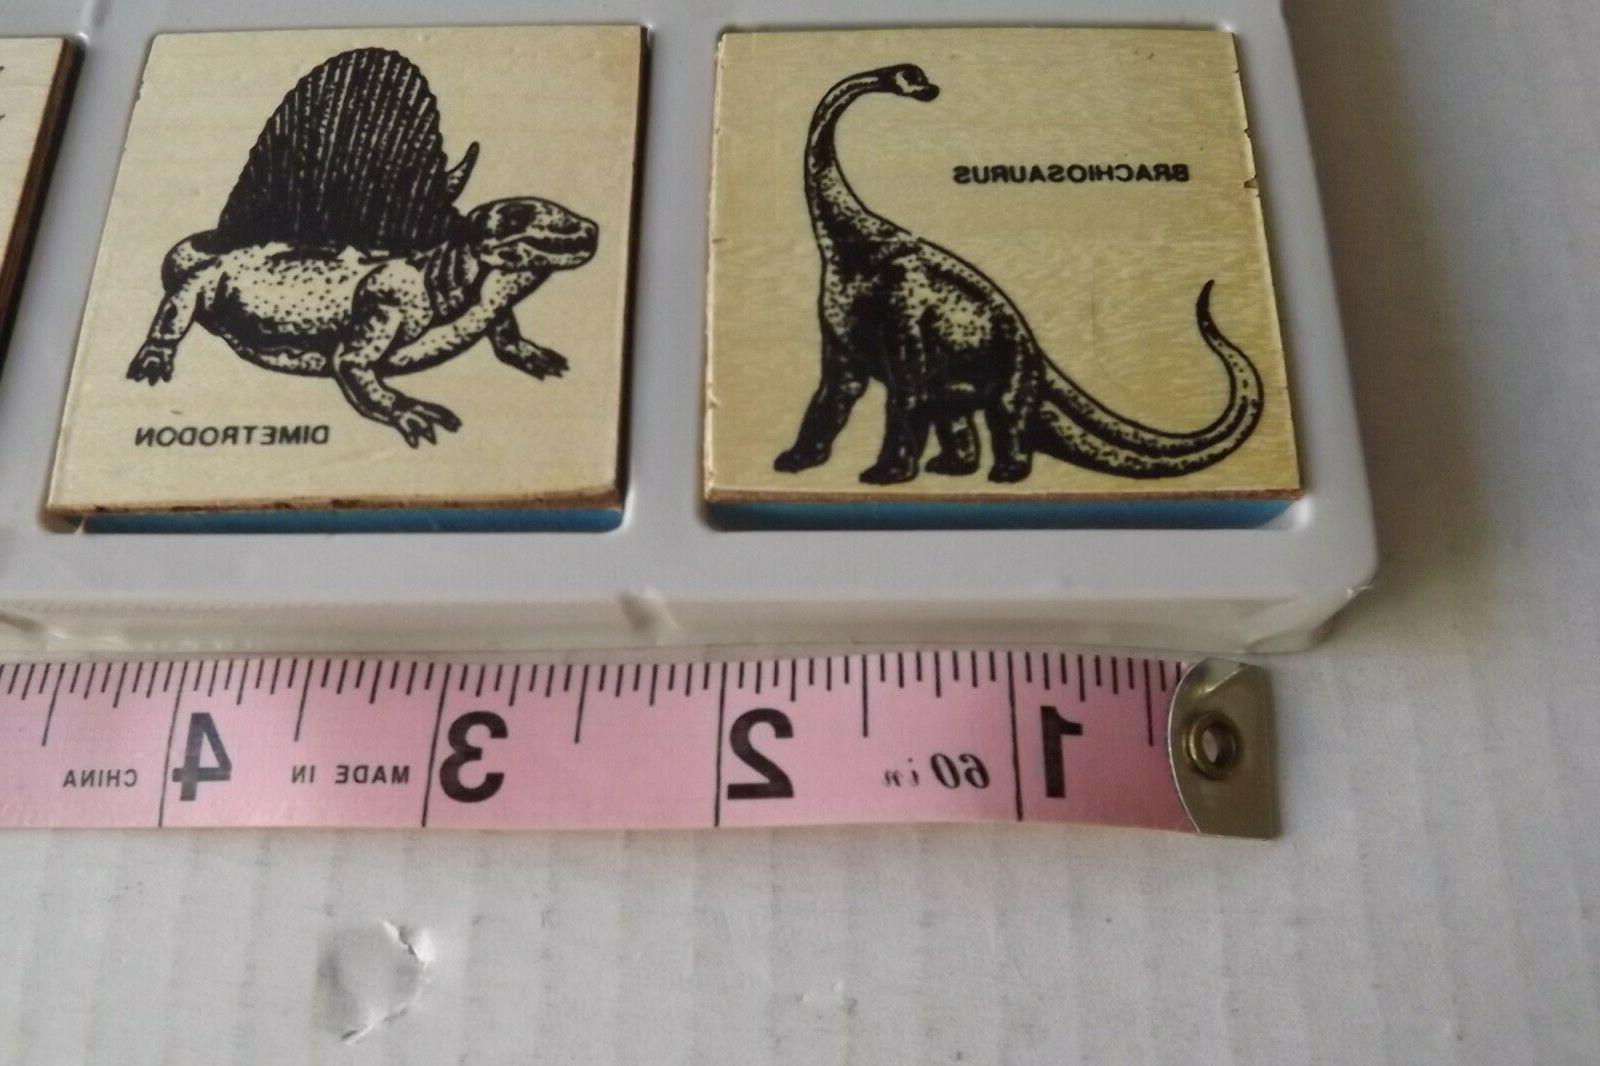 Dinosaur Toys Arts Crafts Hobbies 4+